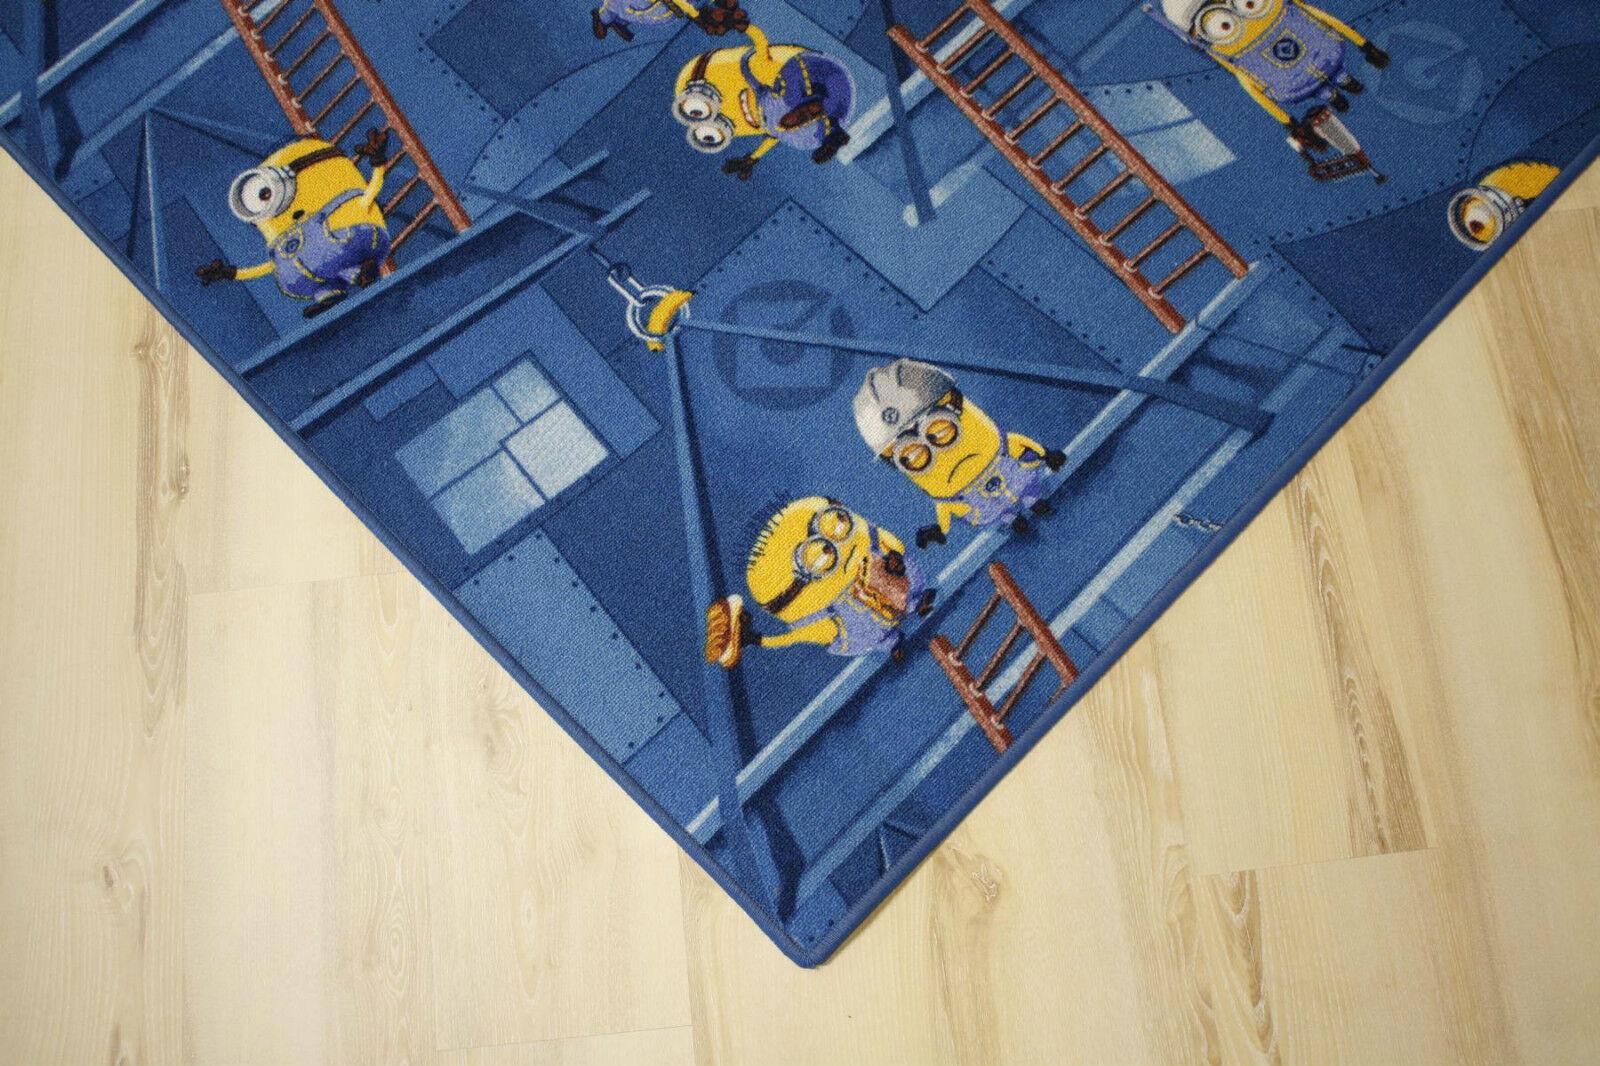 Enfants Tapis Tapis de jeu sbires bleu 200x290 cm NEUF